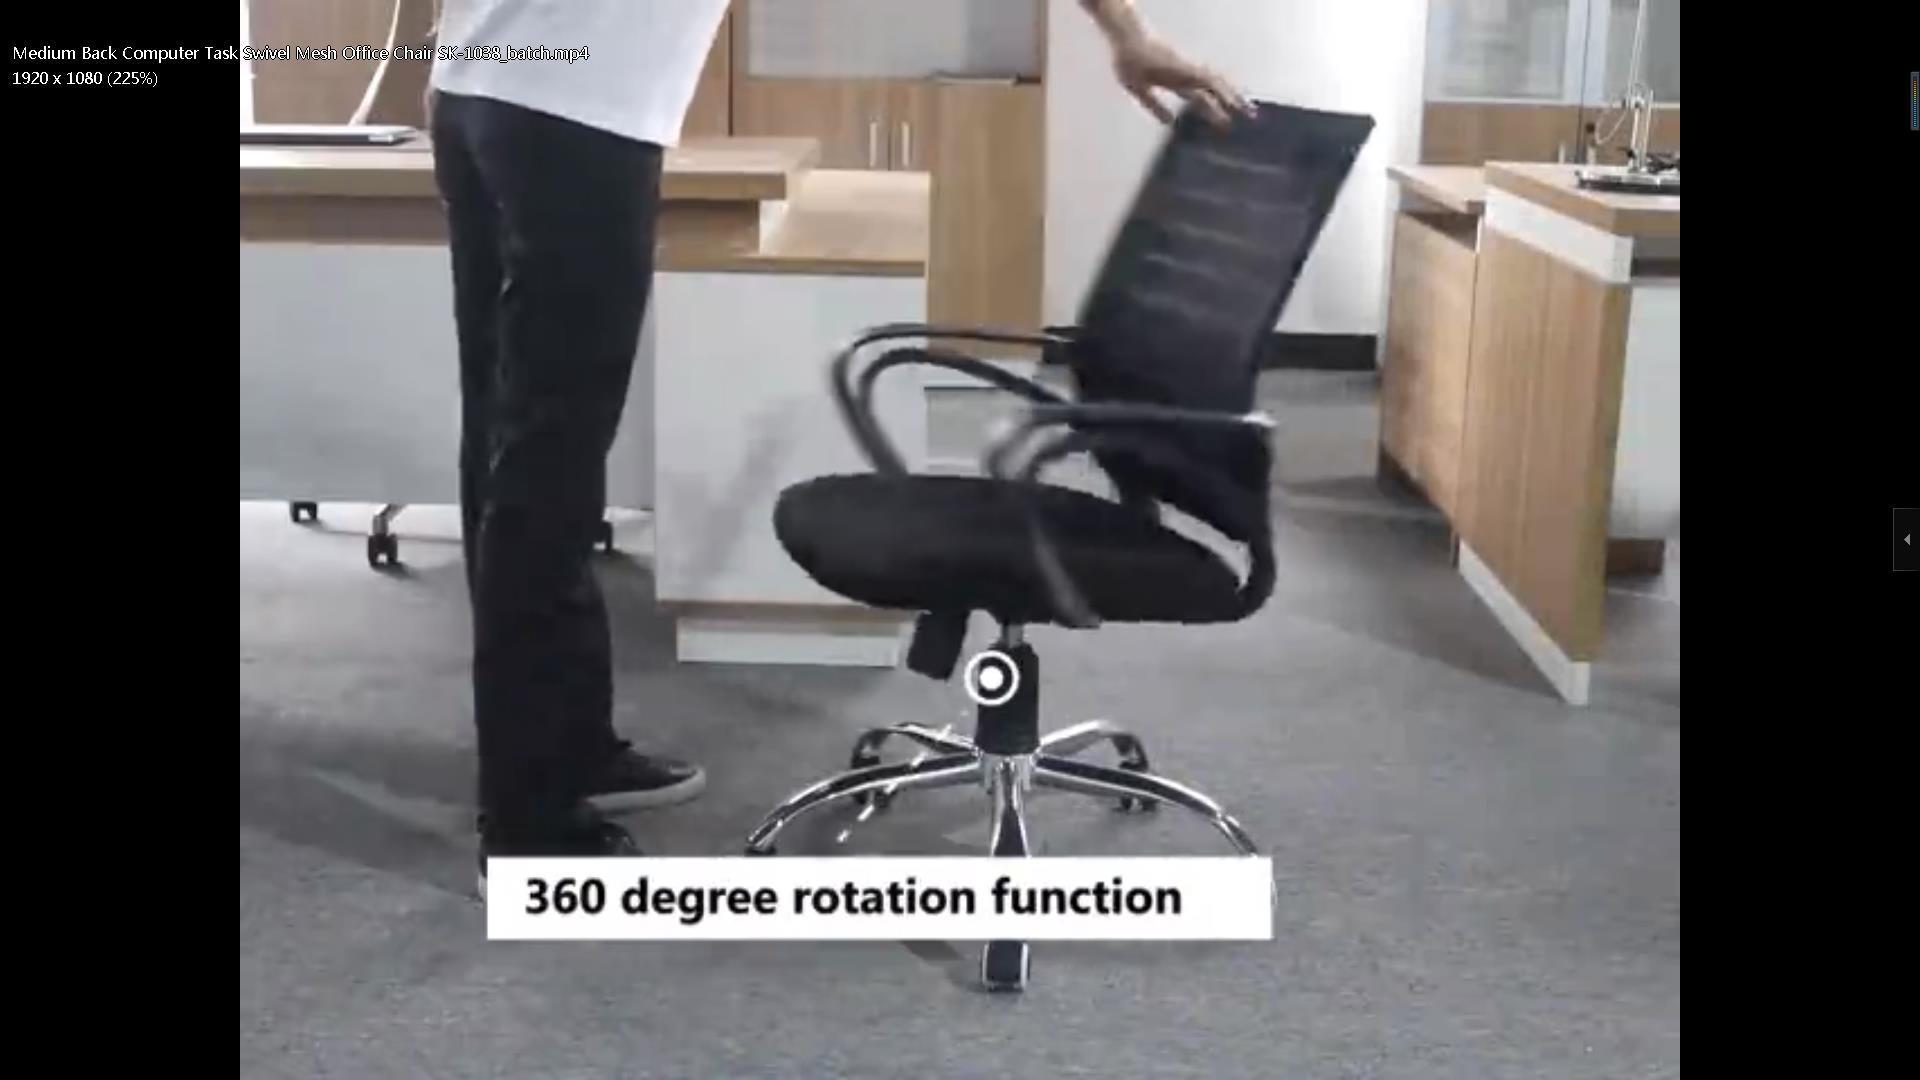 Medium Back Computer Task Swivel Mesh Office Chair SK-1038